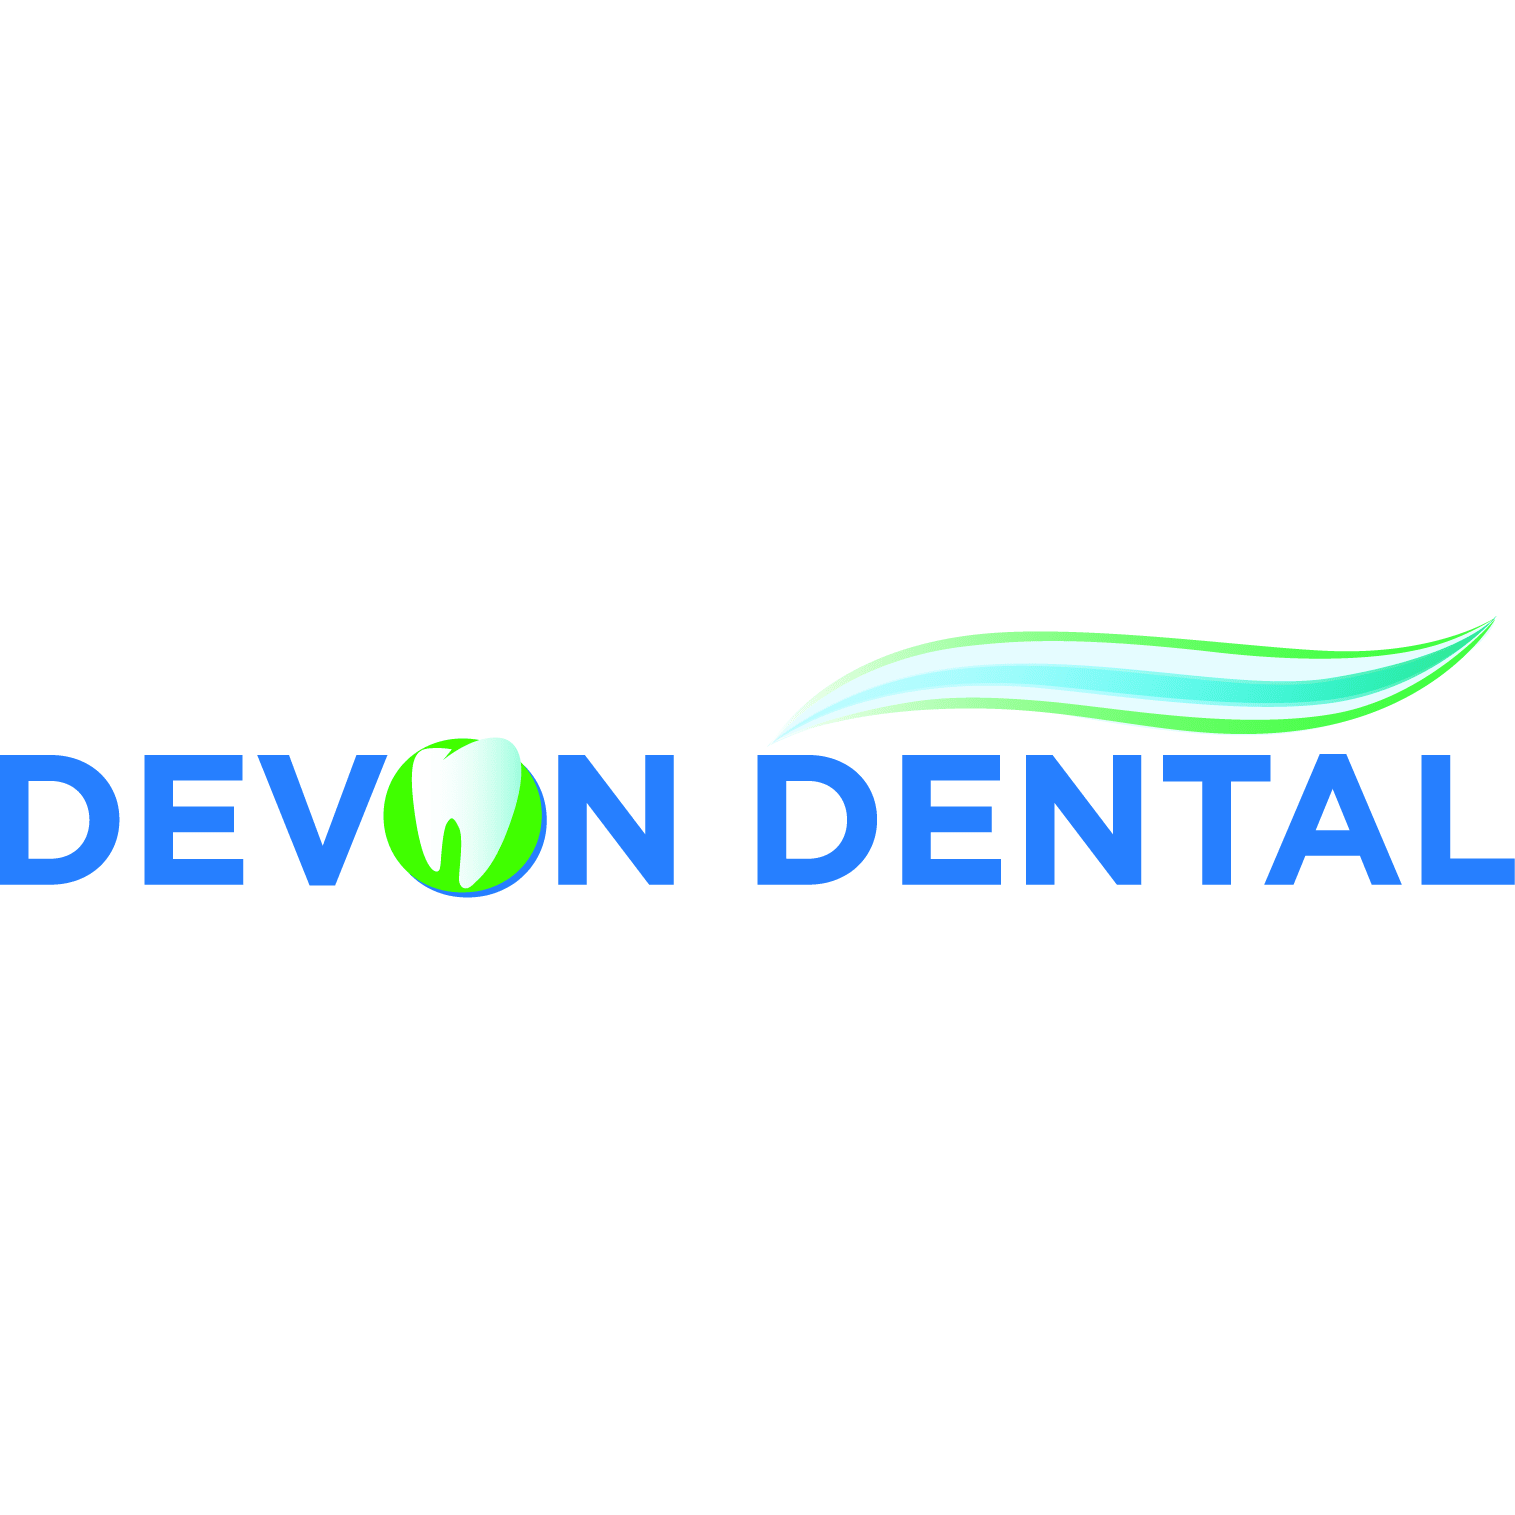 Devon Dental, Inc.